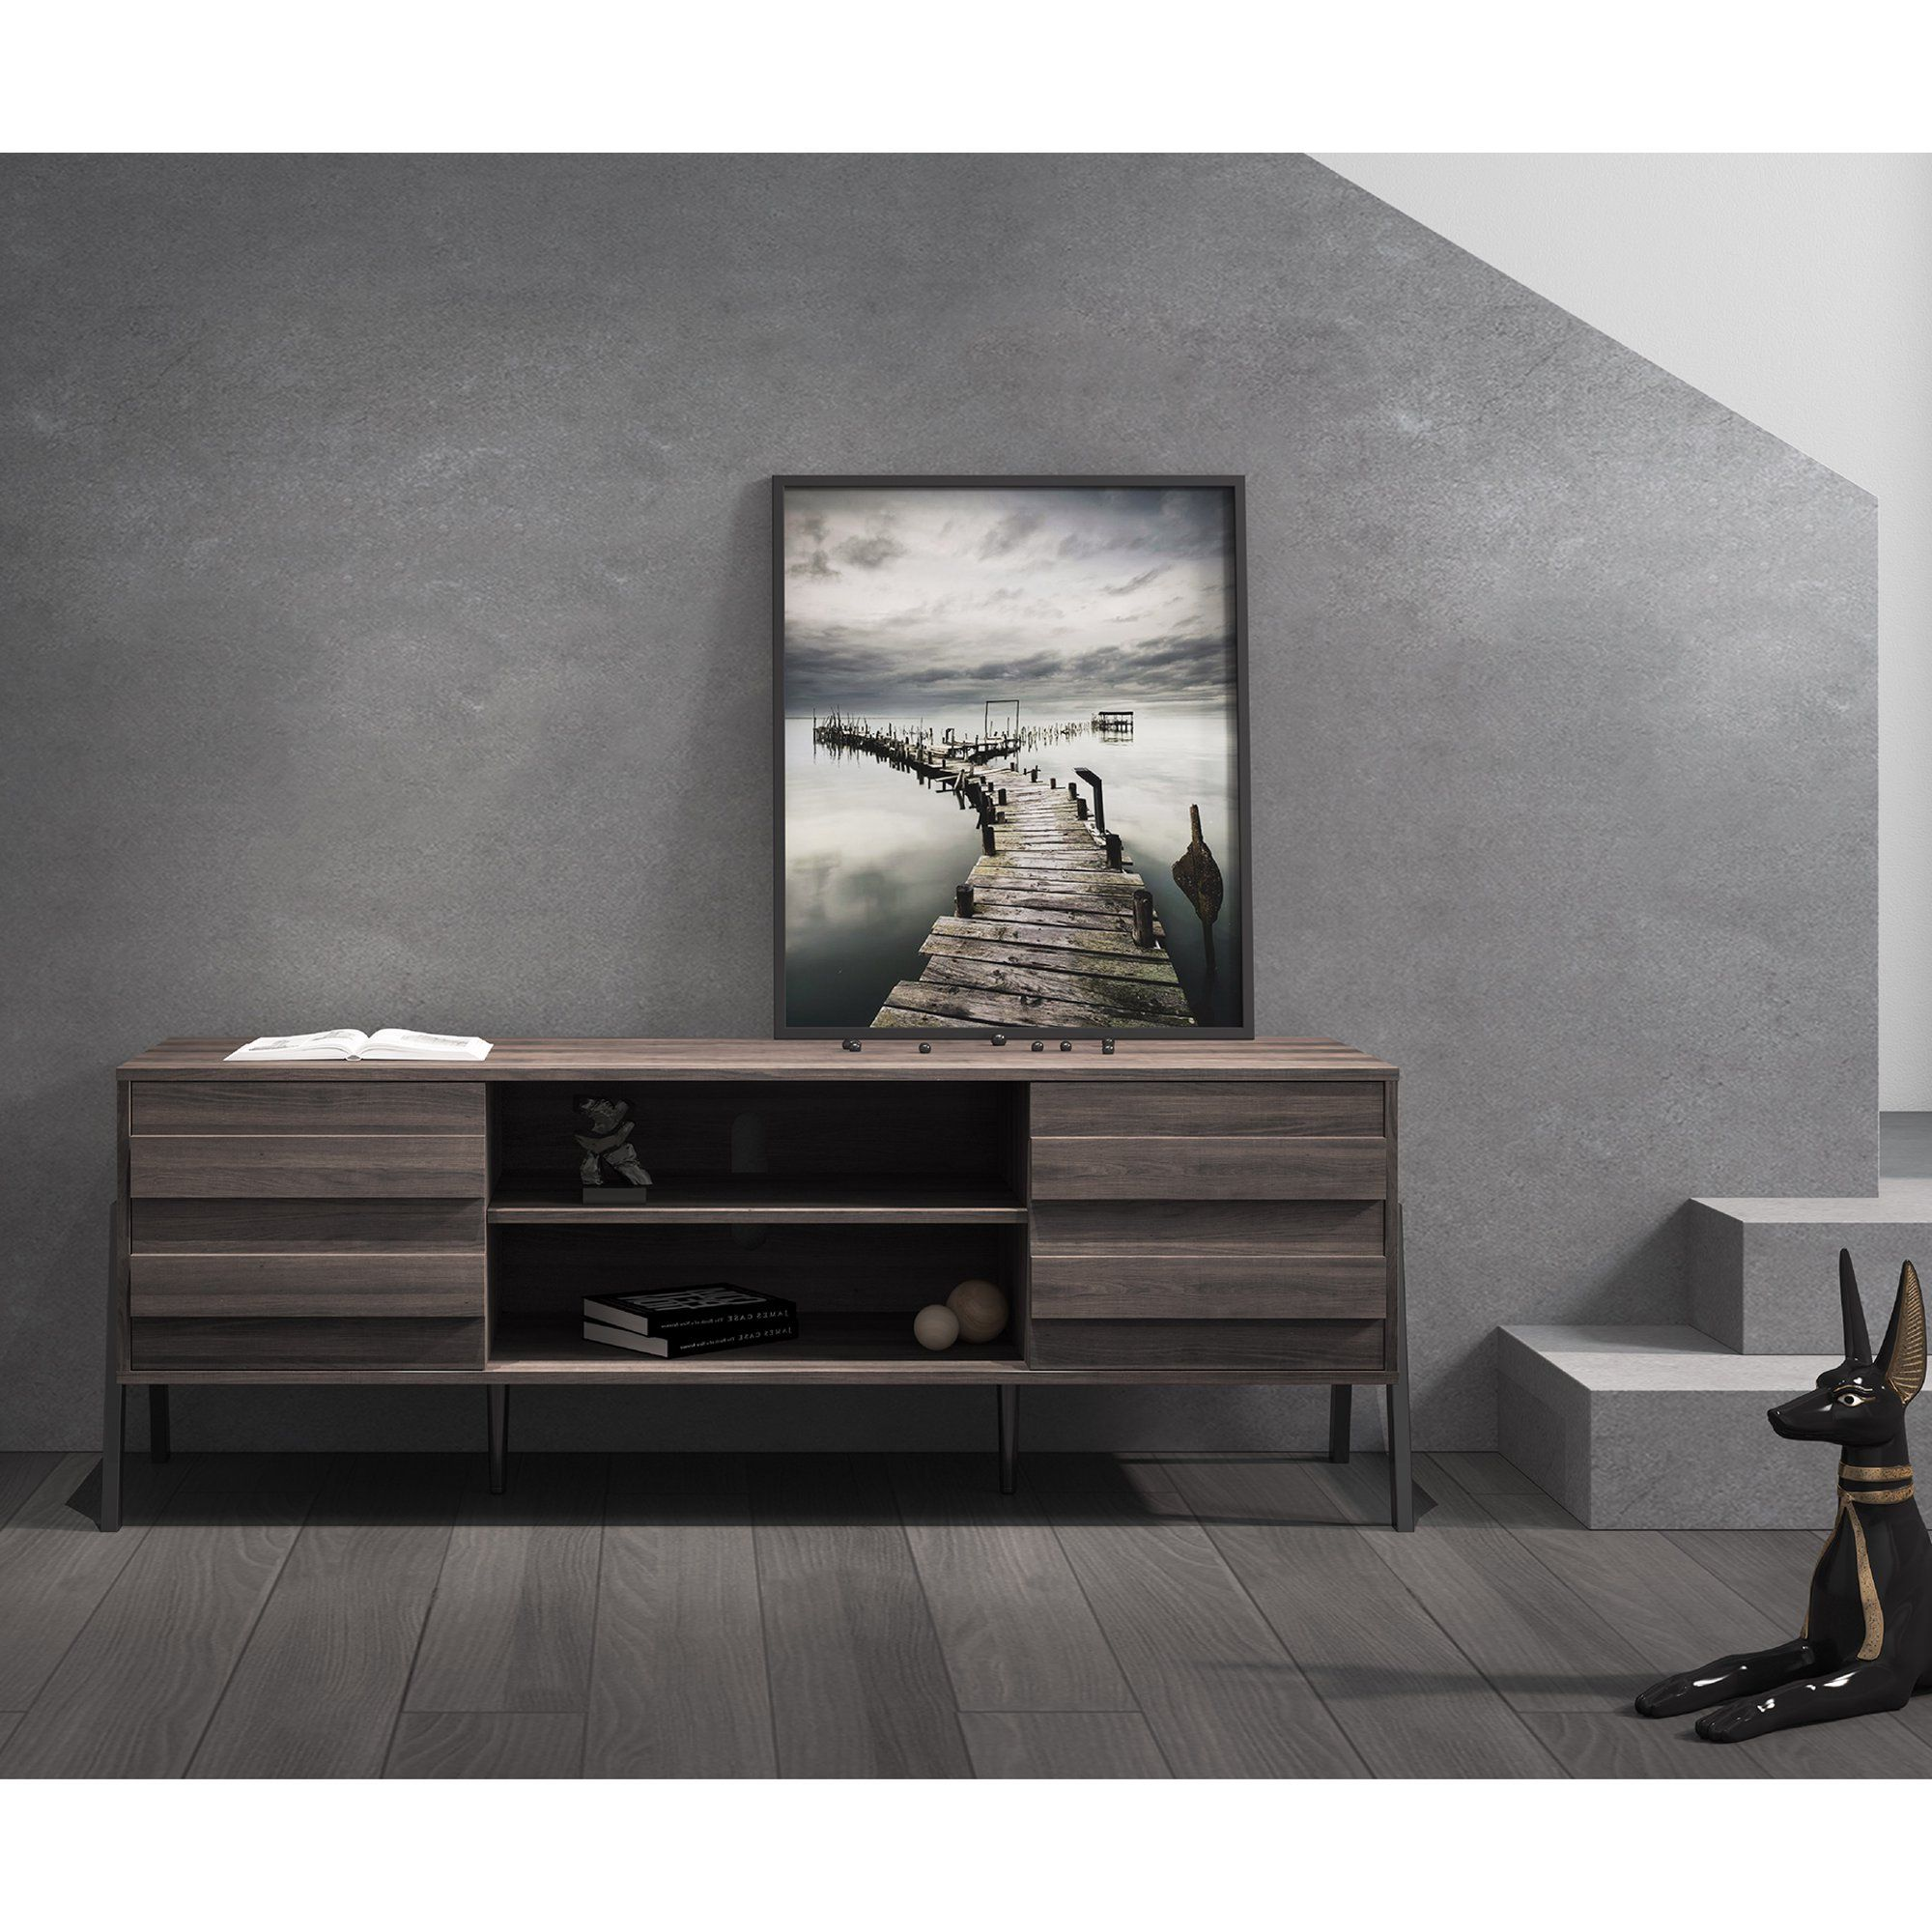 34++ Wampat tv stand model